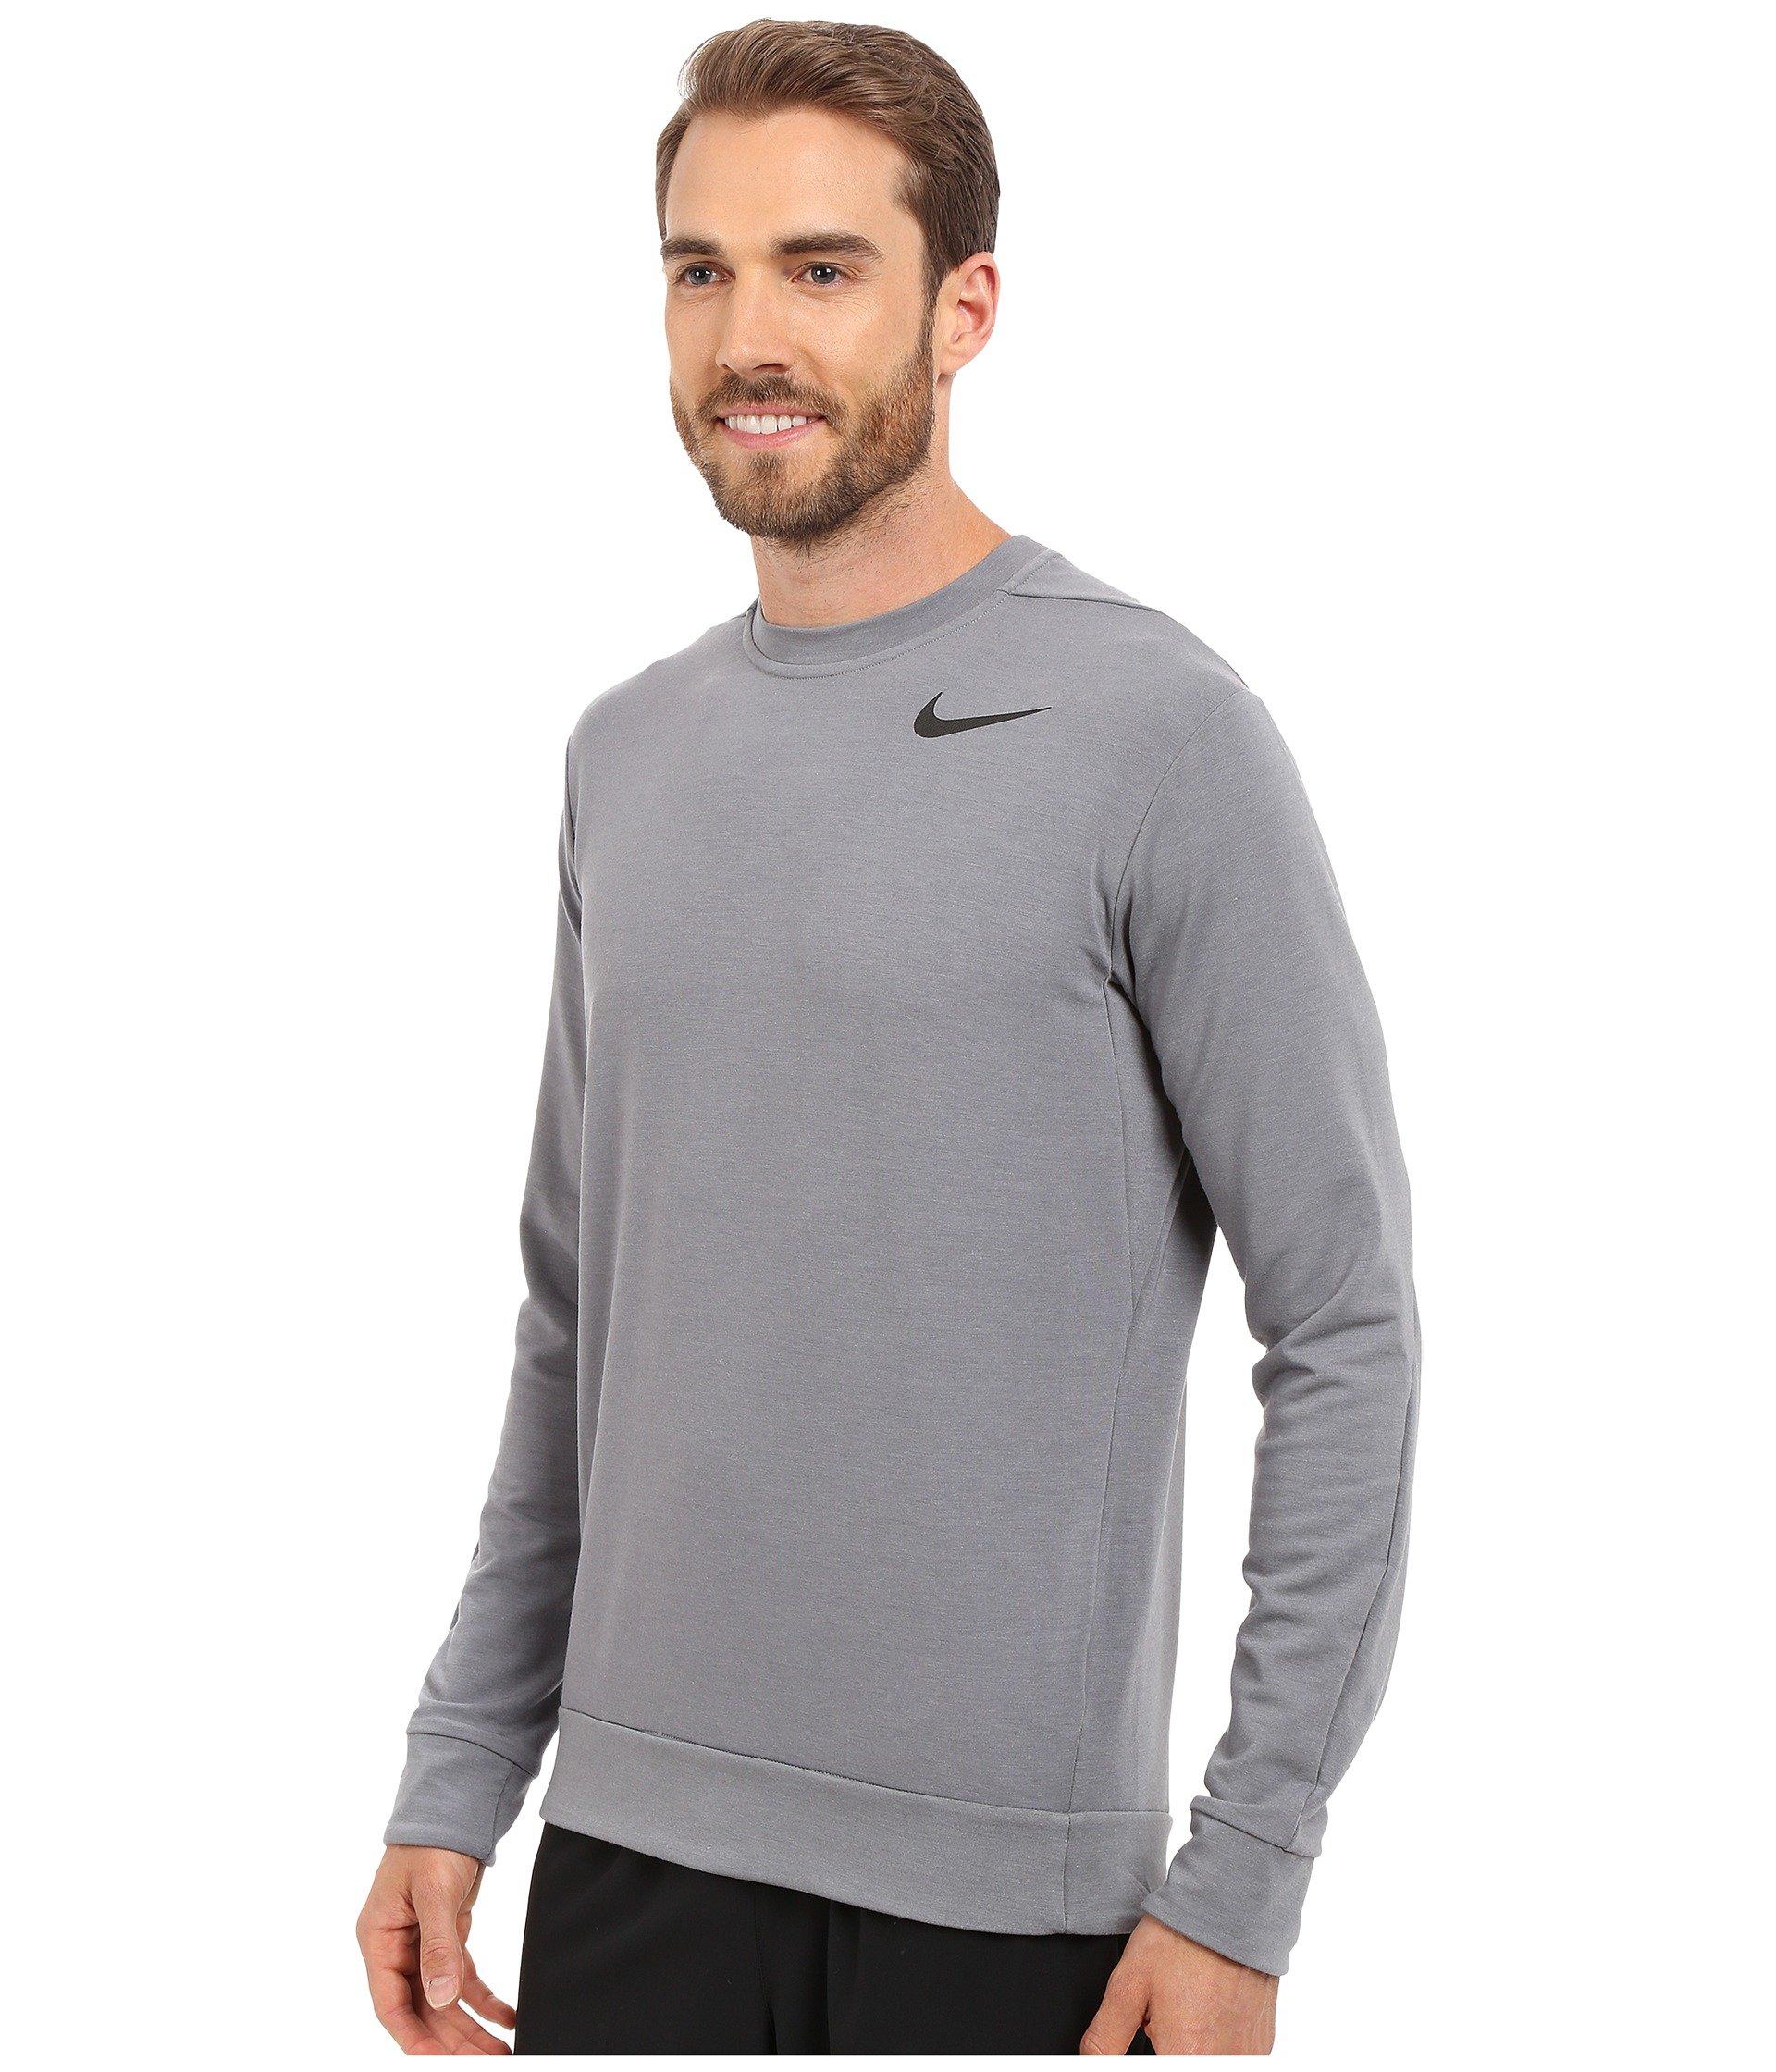 909d62ec8307d Lyst - Nike Dri-fit™ Fleece Crew Training Shirt in Gray for Men